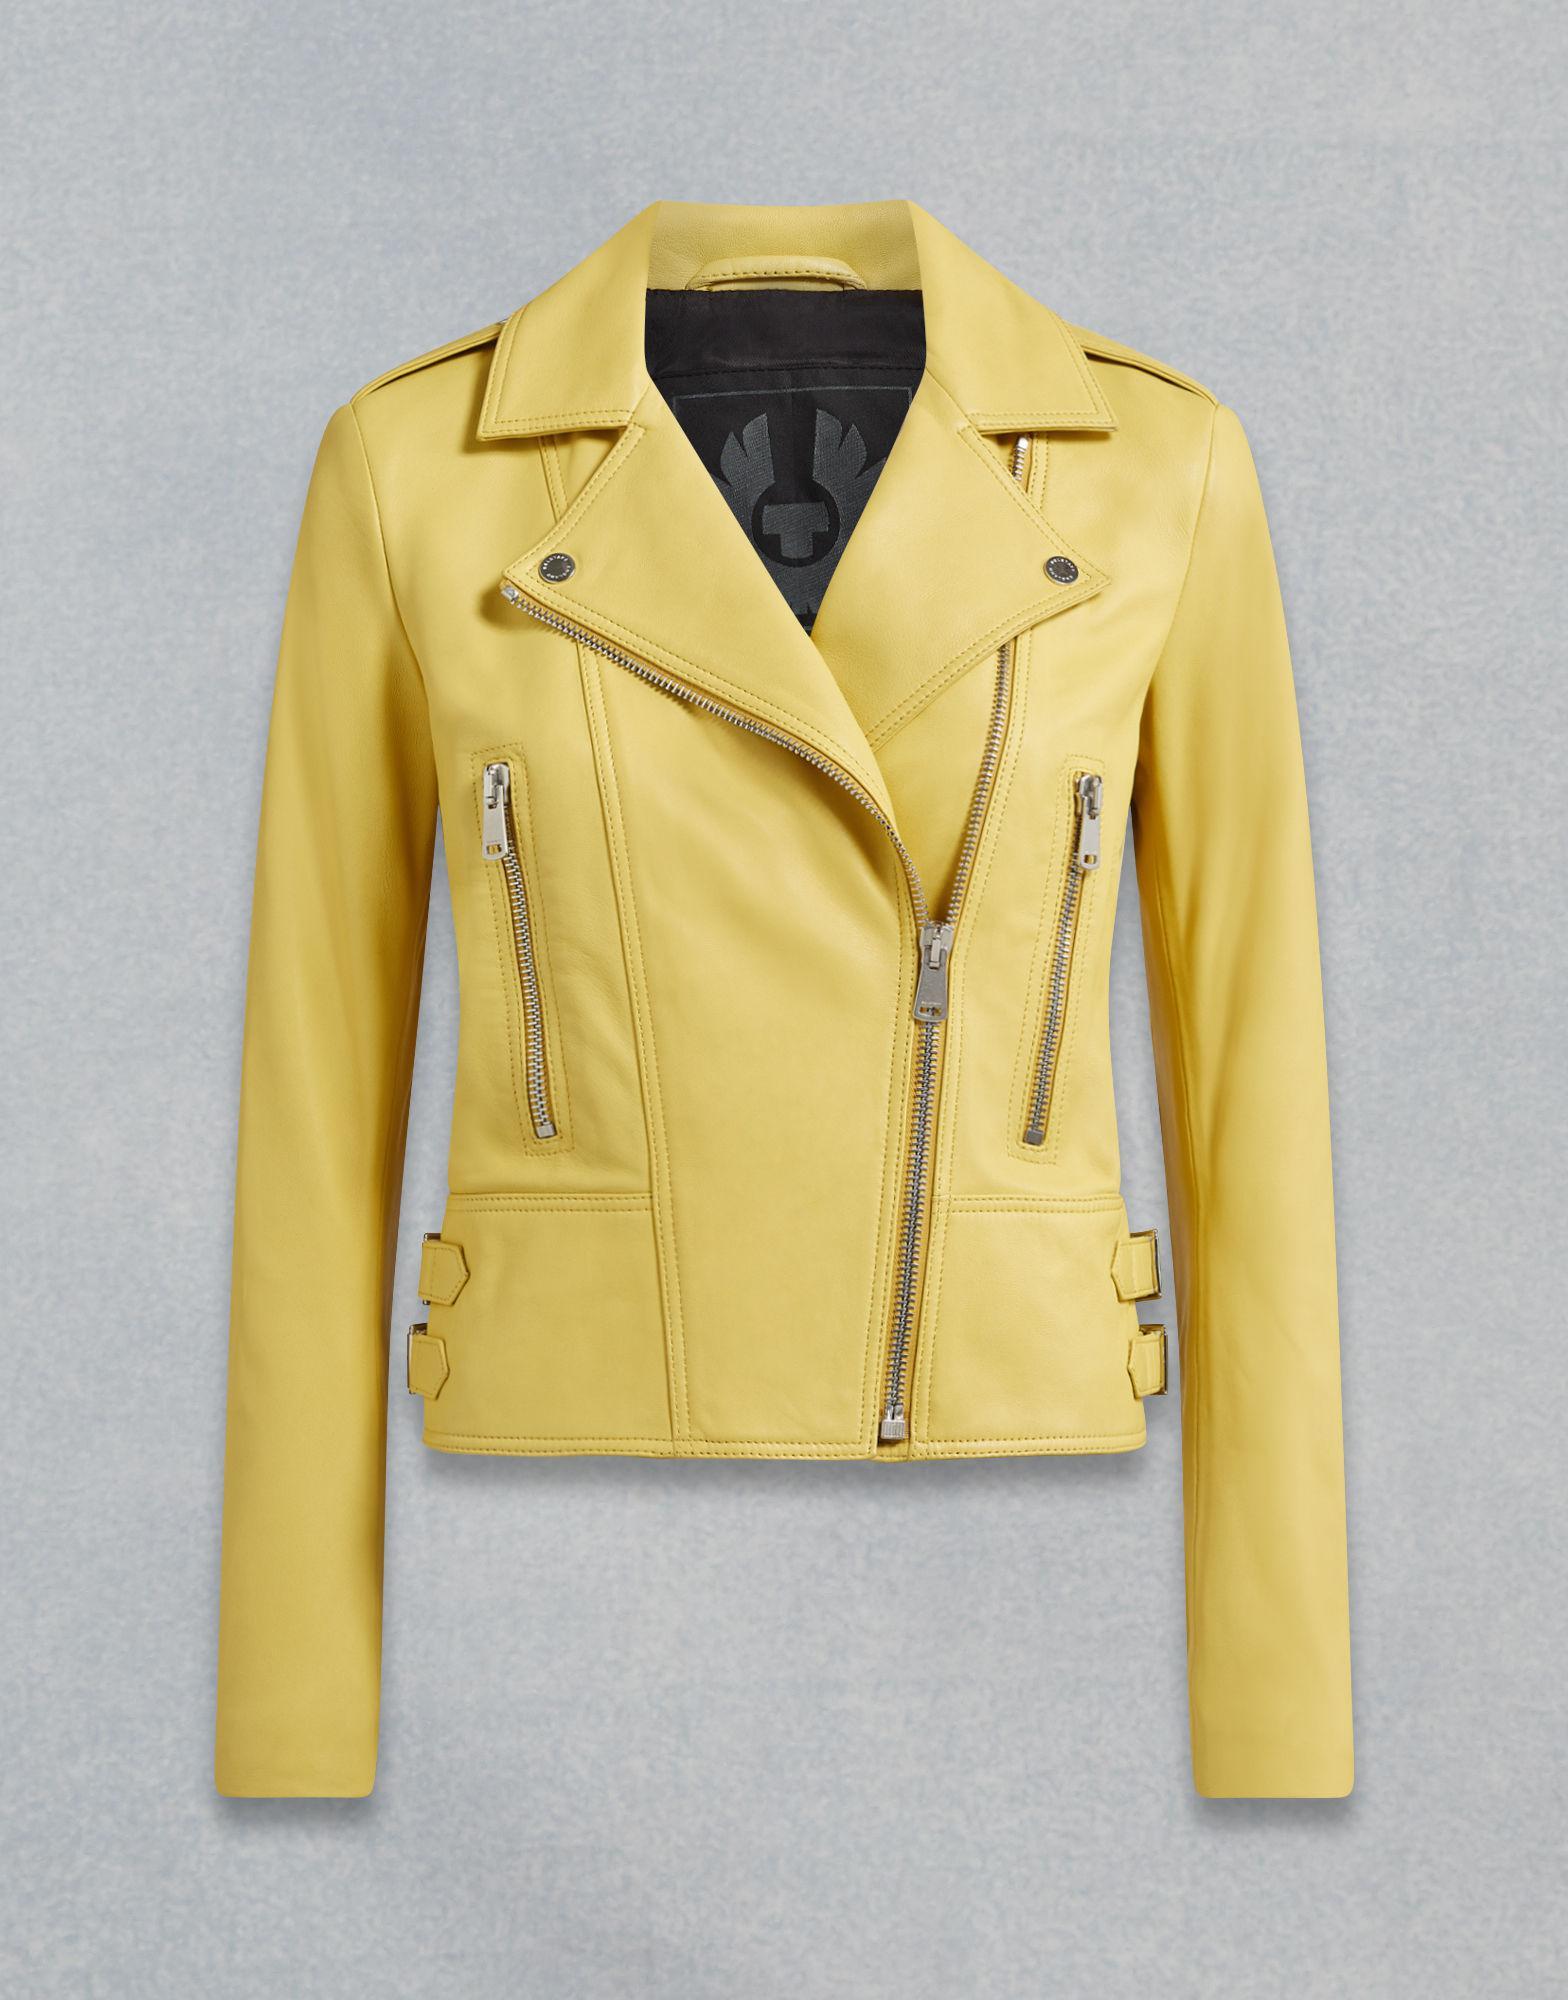 609f4bcae959 Lyst - Belstaff Marvingt 2.0 Jacket in Yellow for Men